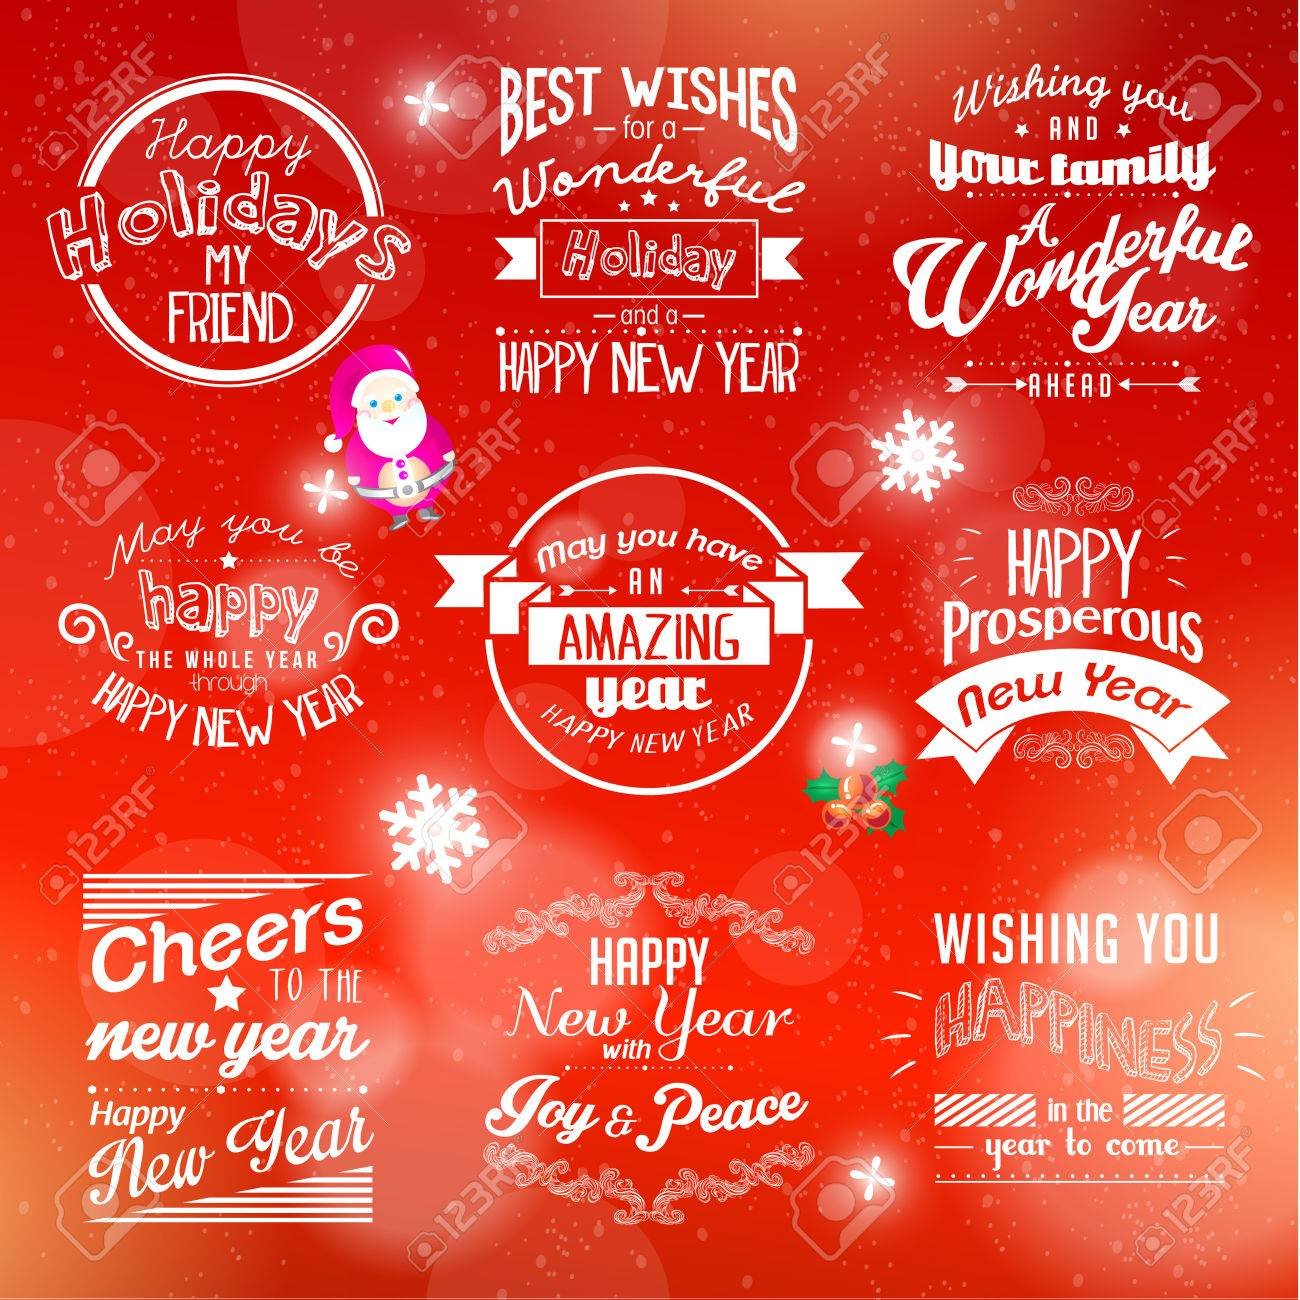 Merry christmas and happy new year 2015 season greetings quote merry christmas and happy new year 2015 season greetings quote vector design stock vector 33533222 kristyandbryce Choice Image